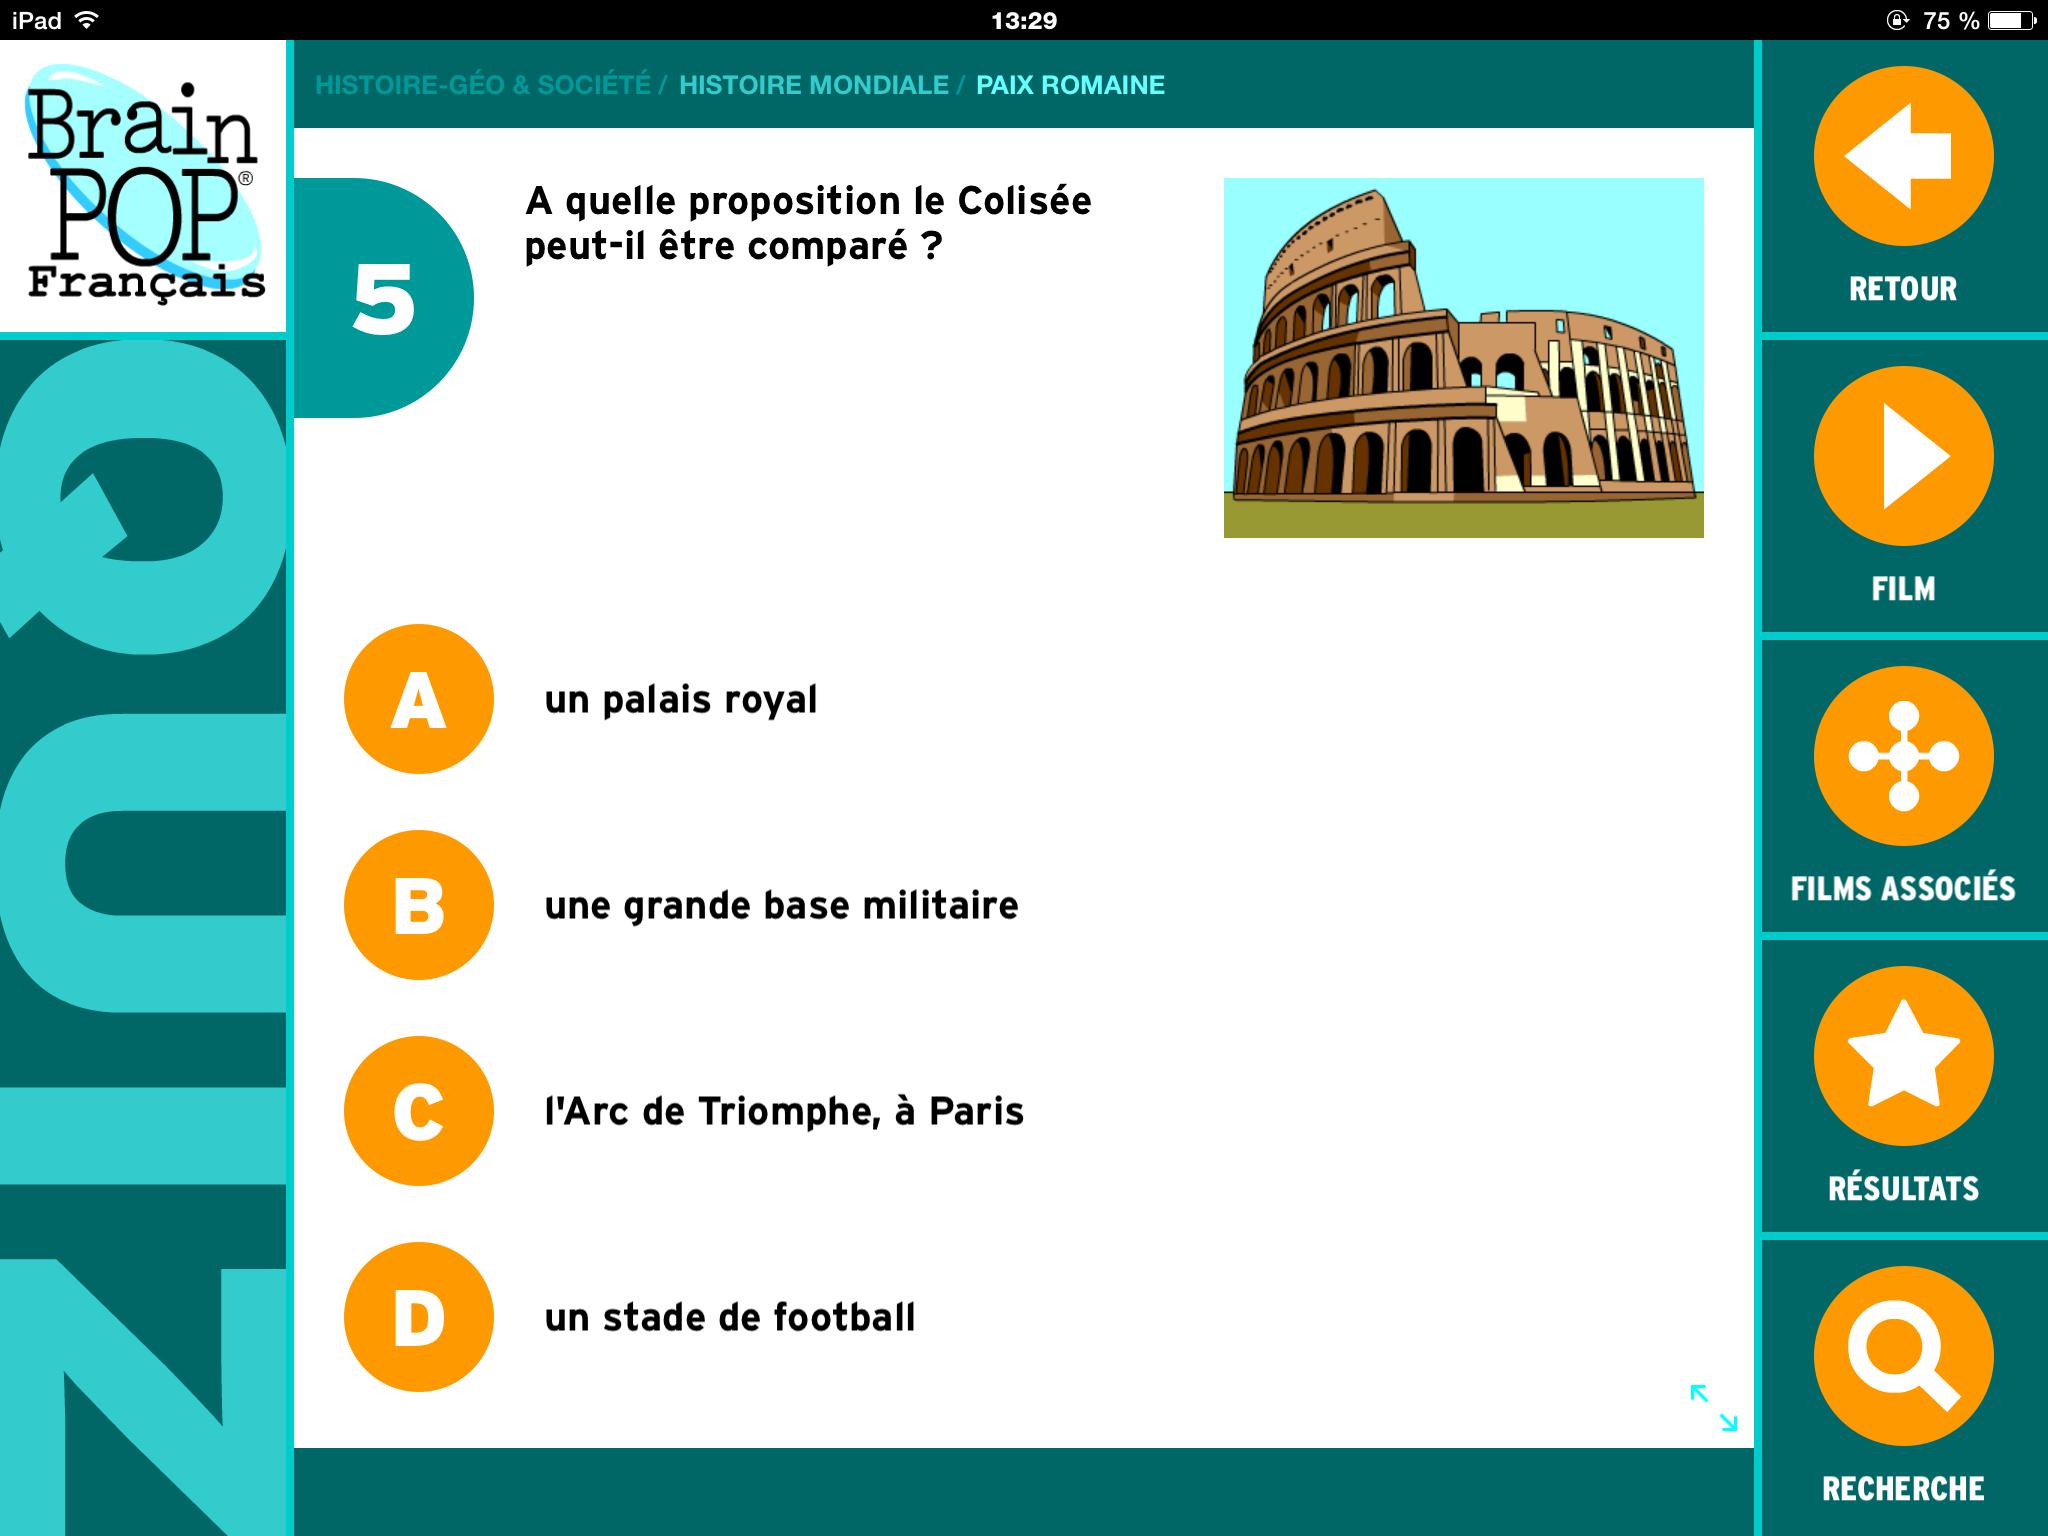 Brainpop la pax romana quizz2